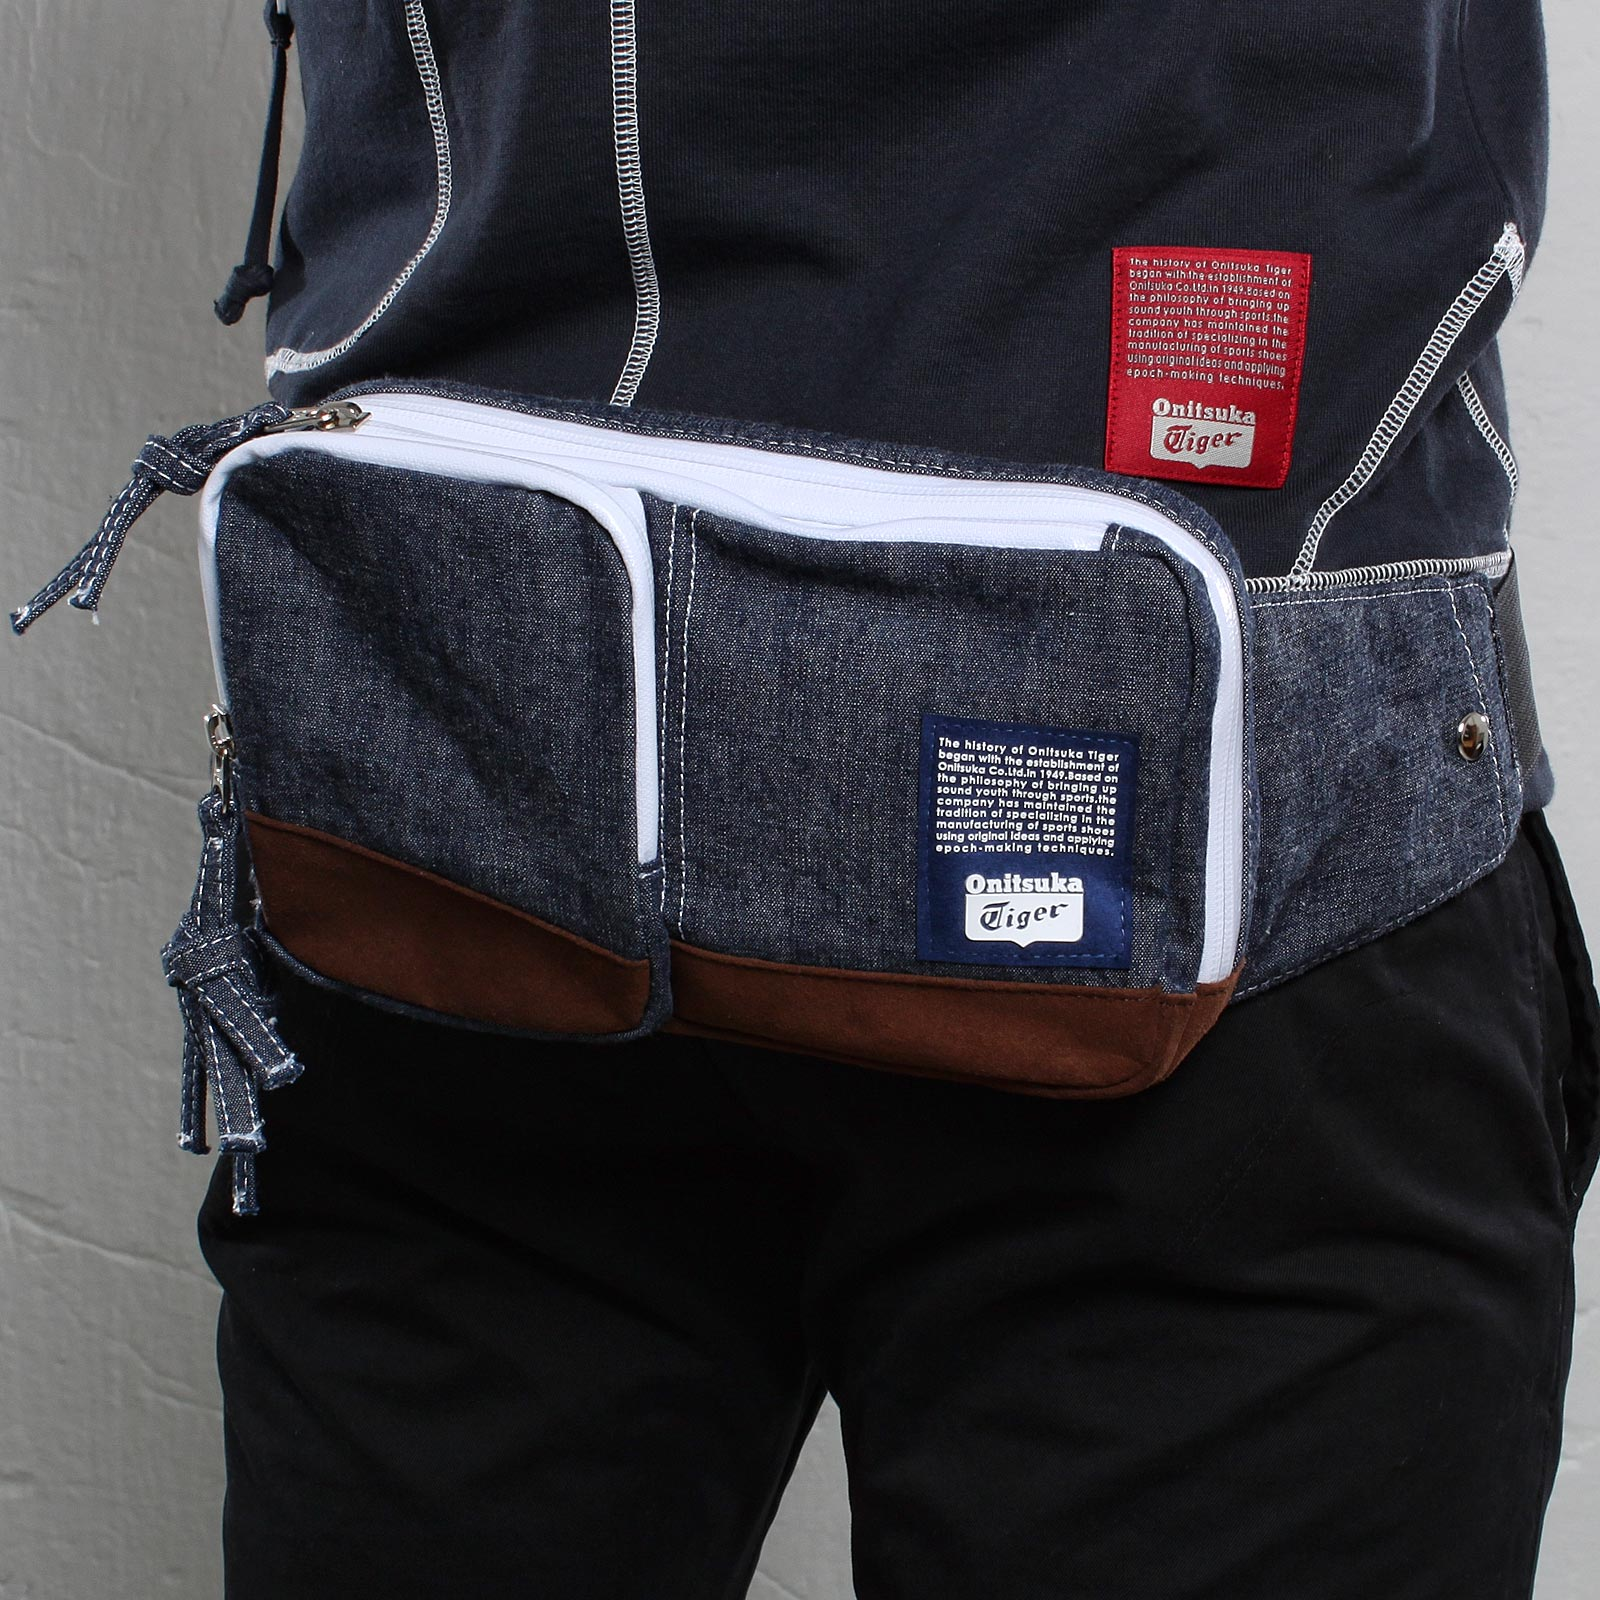 Onitsuka Tiger Indigo Waist Bag - EOT928-0052